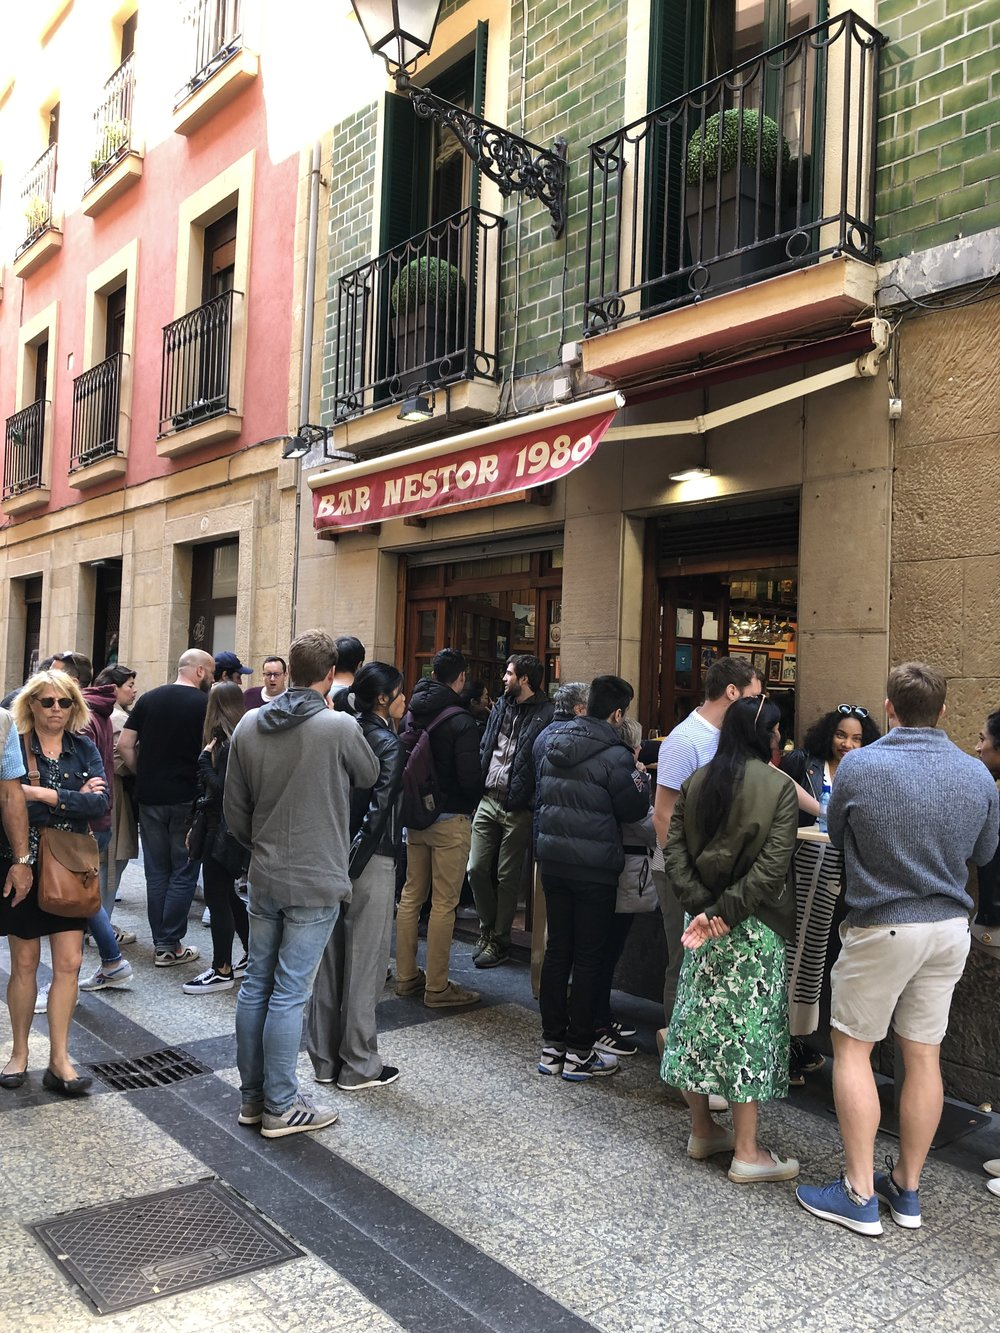 Photo I took while waiting to eat tomatoes, peppers & steak at bar Nestor in San Sebastian